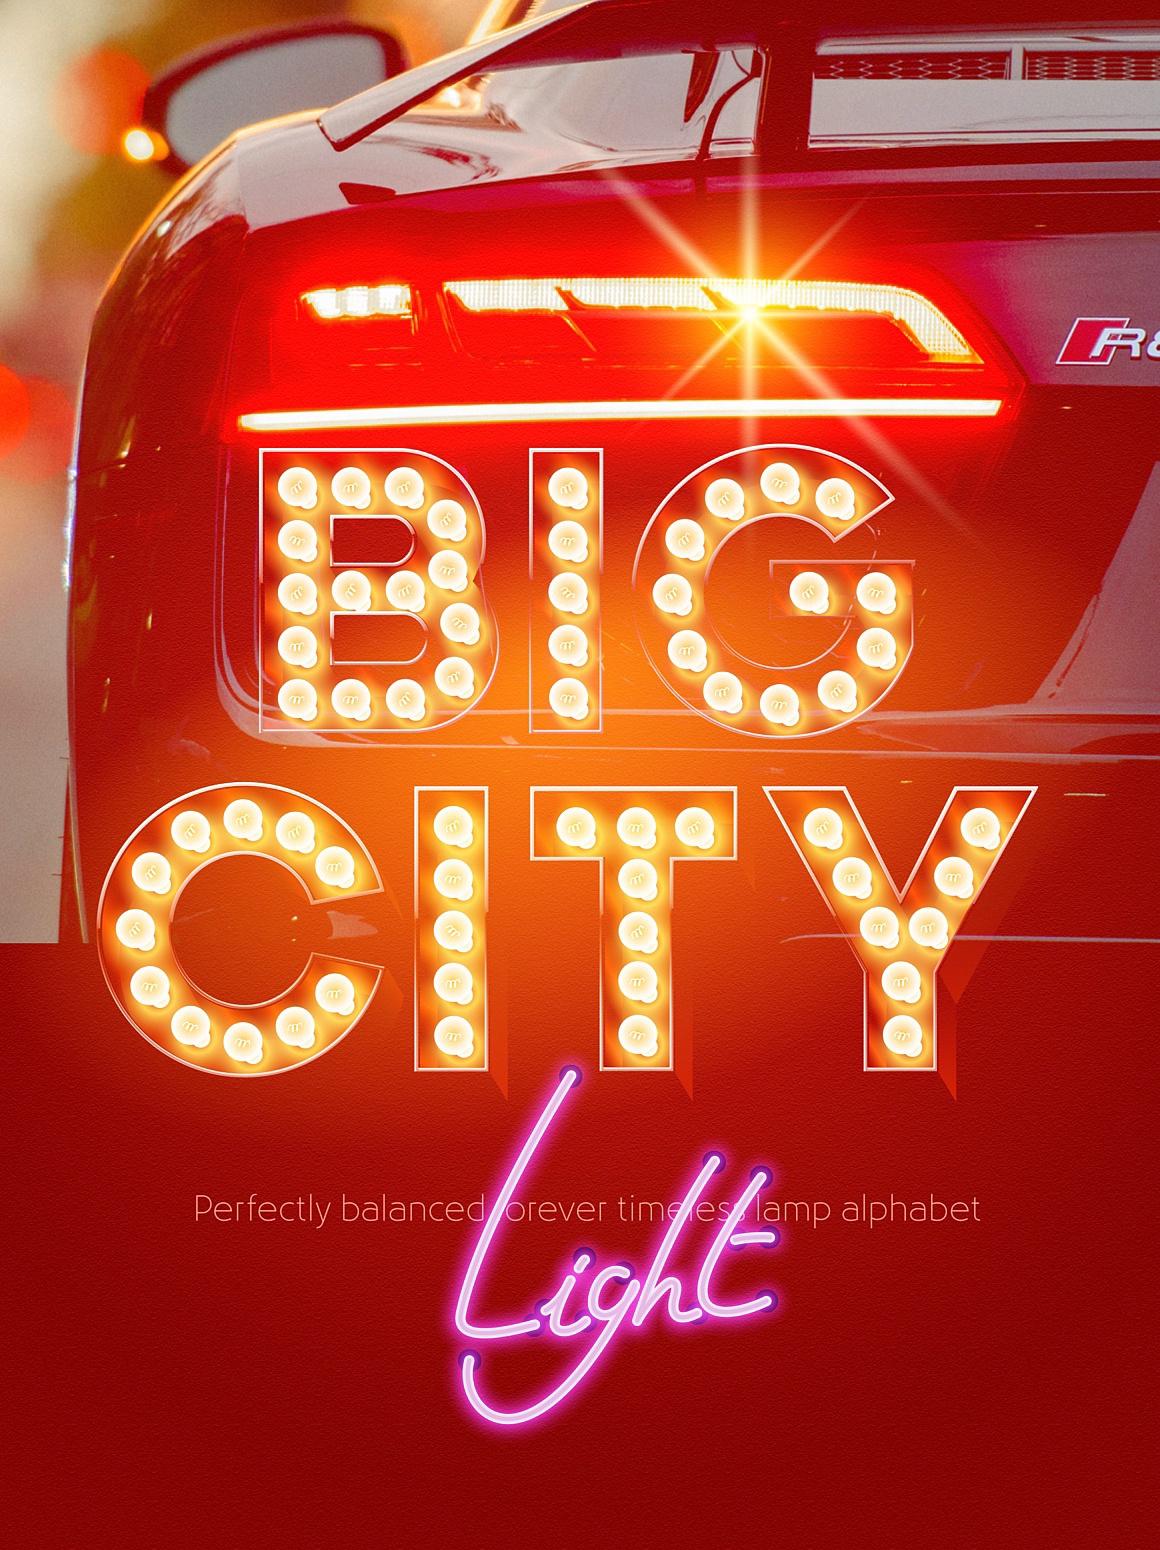 3d Lamp Classic promo-Old-bulp-lamp-alphabet-red_3.jpg